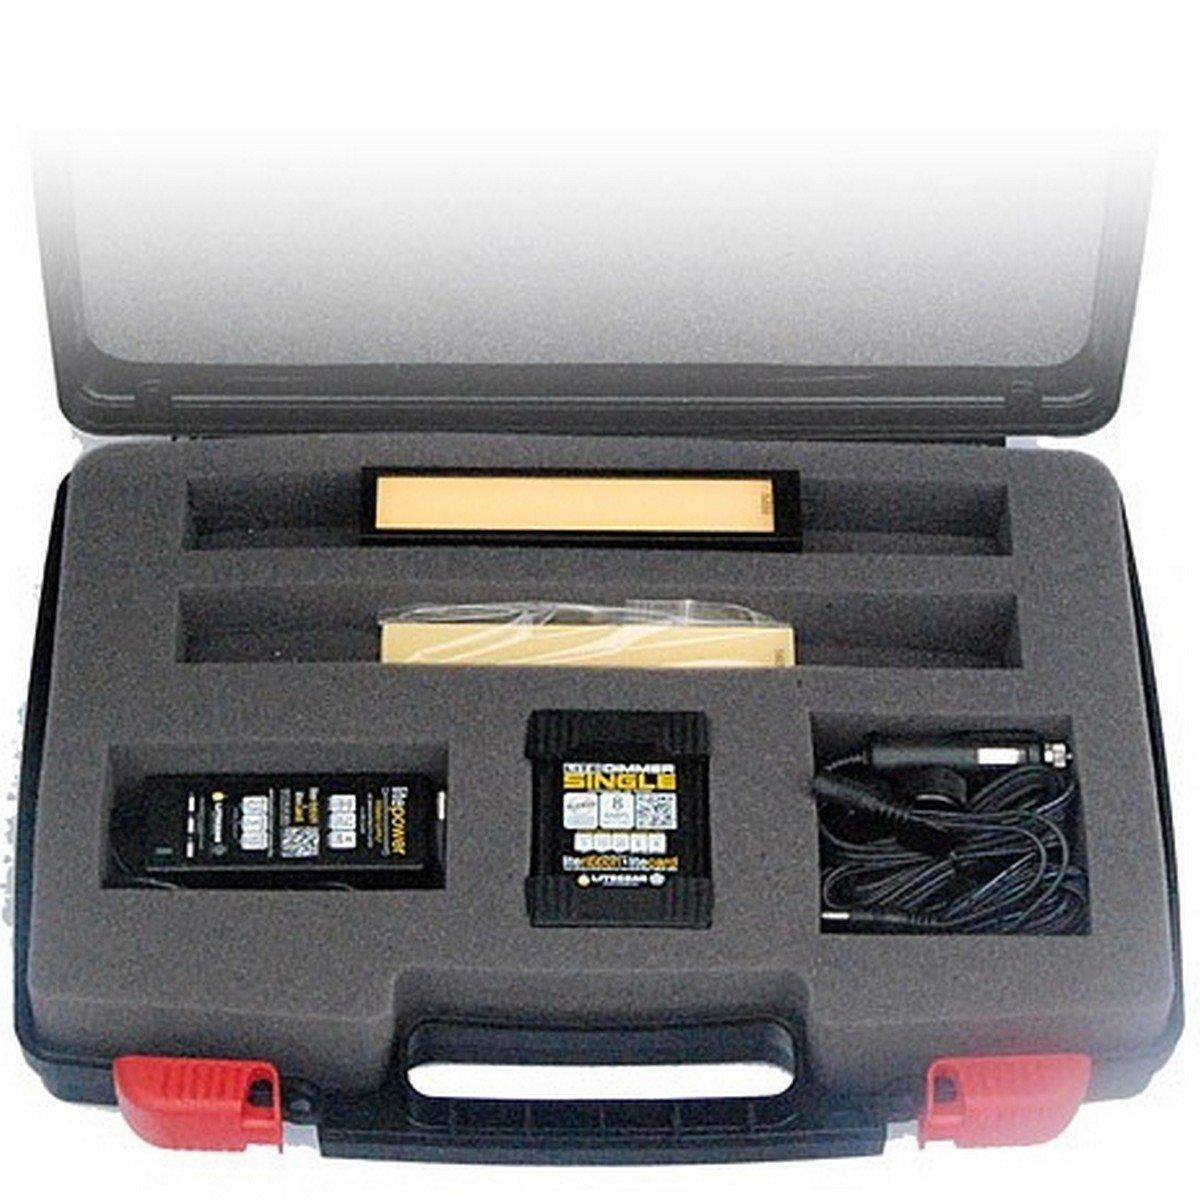 Cineo照明Matchstix単一電源キット|万能ライトソース6インチ701.0106   B00VESO0KI